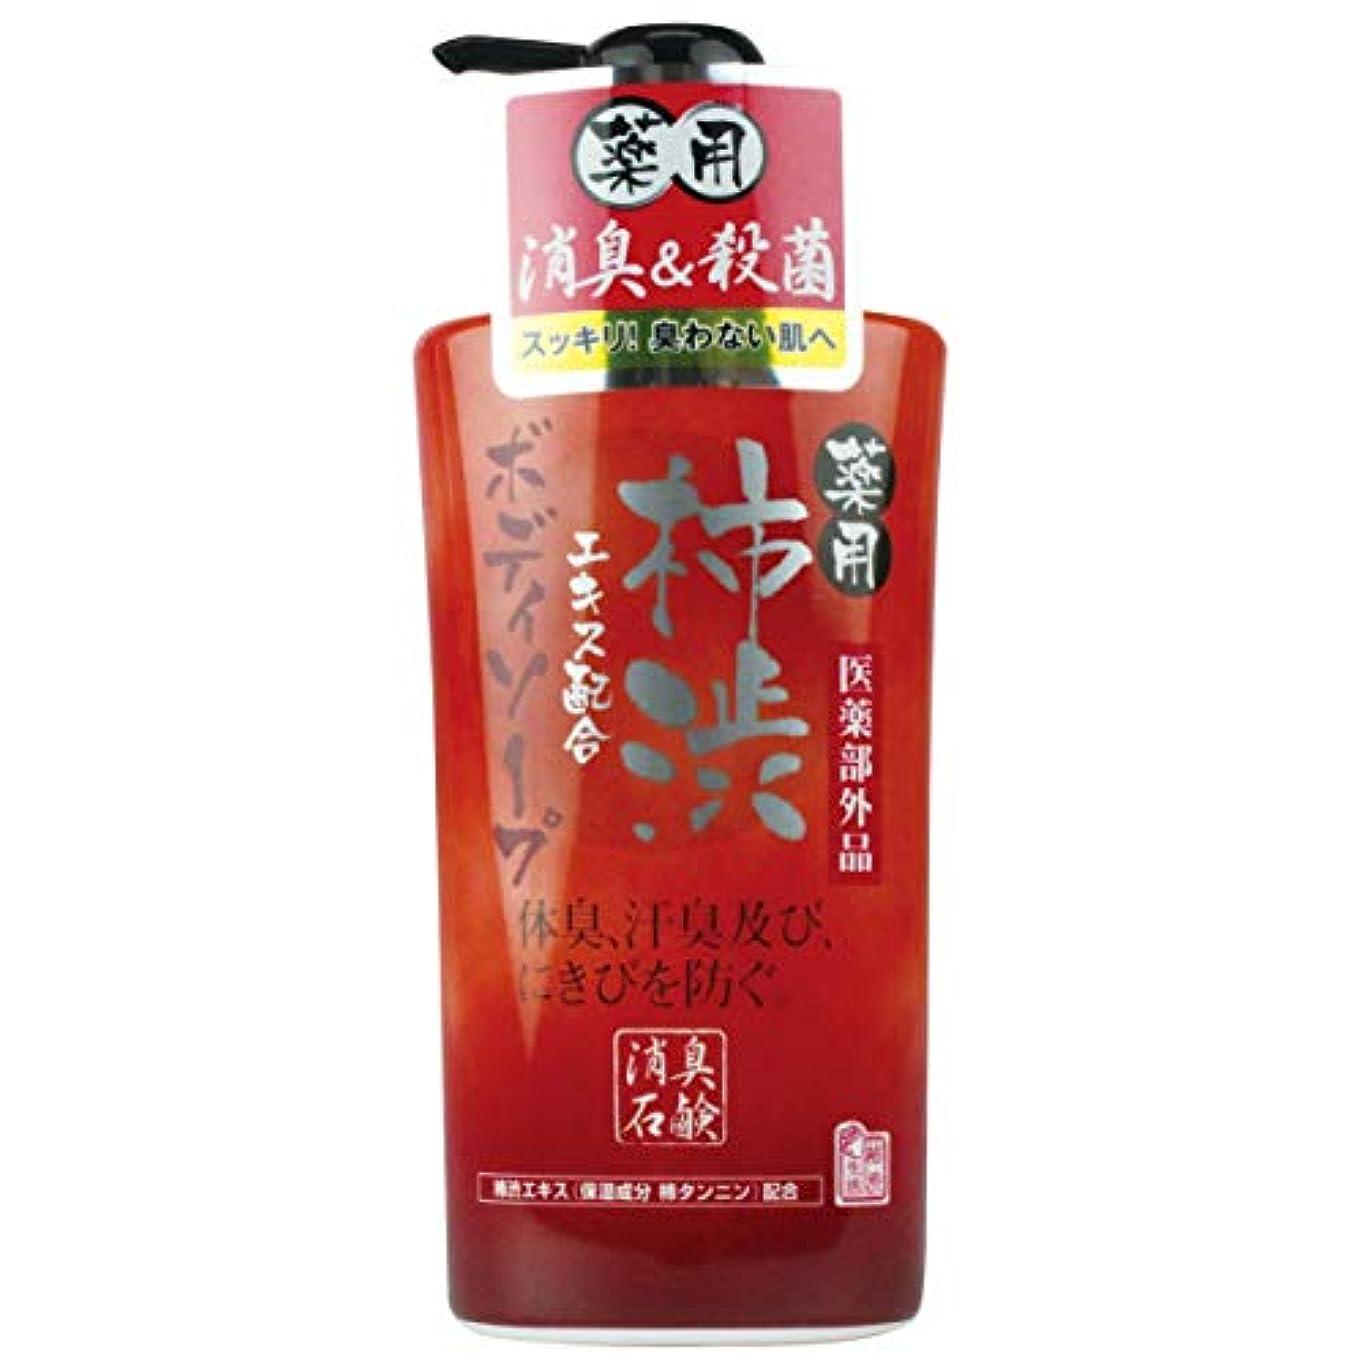 太字情緒的新聞薬用柿渋 ボディソープ 550mL 【医薬部外品】